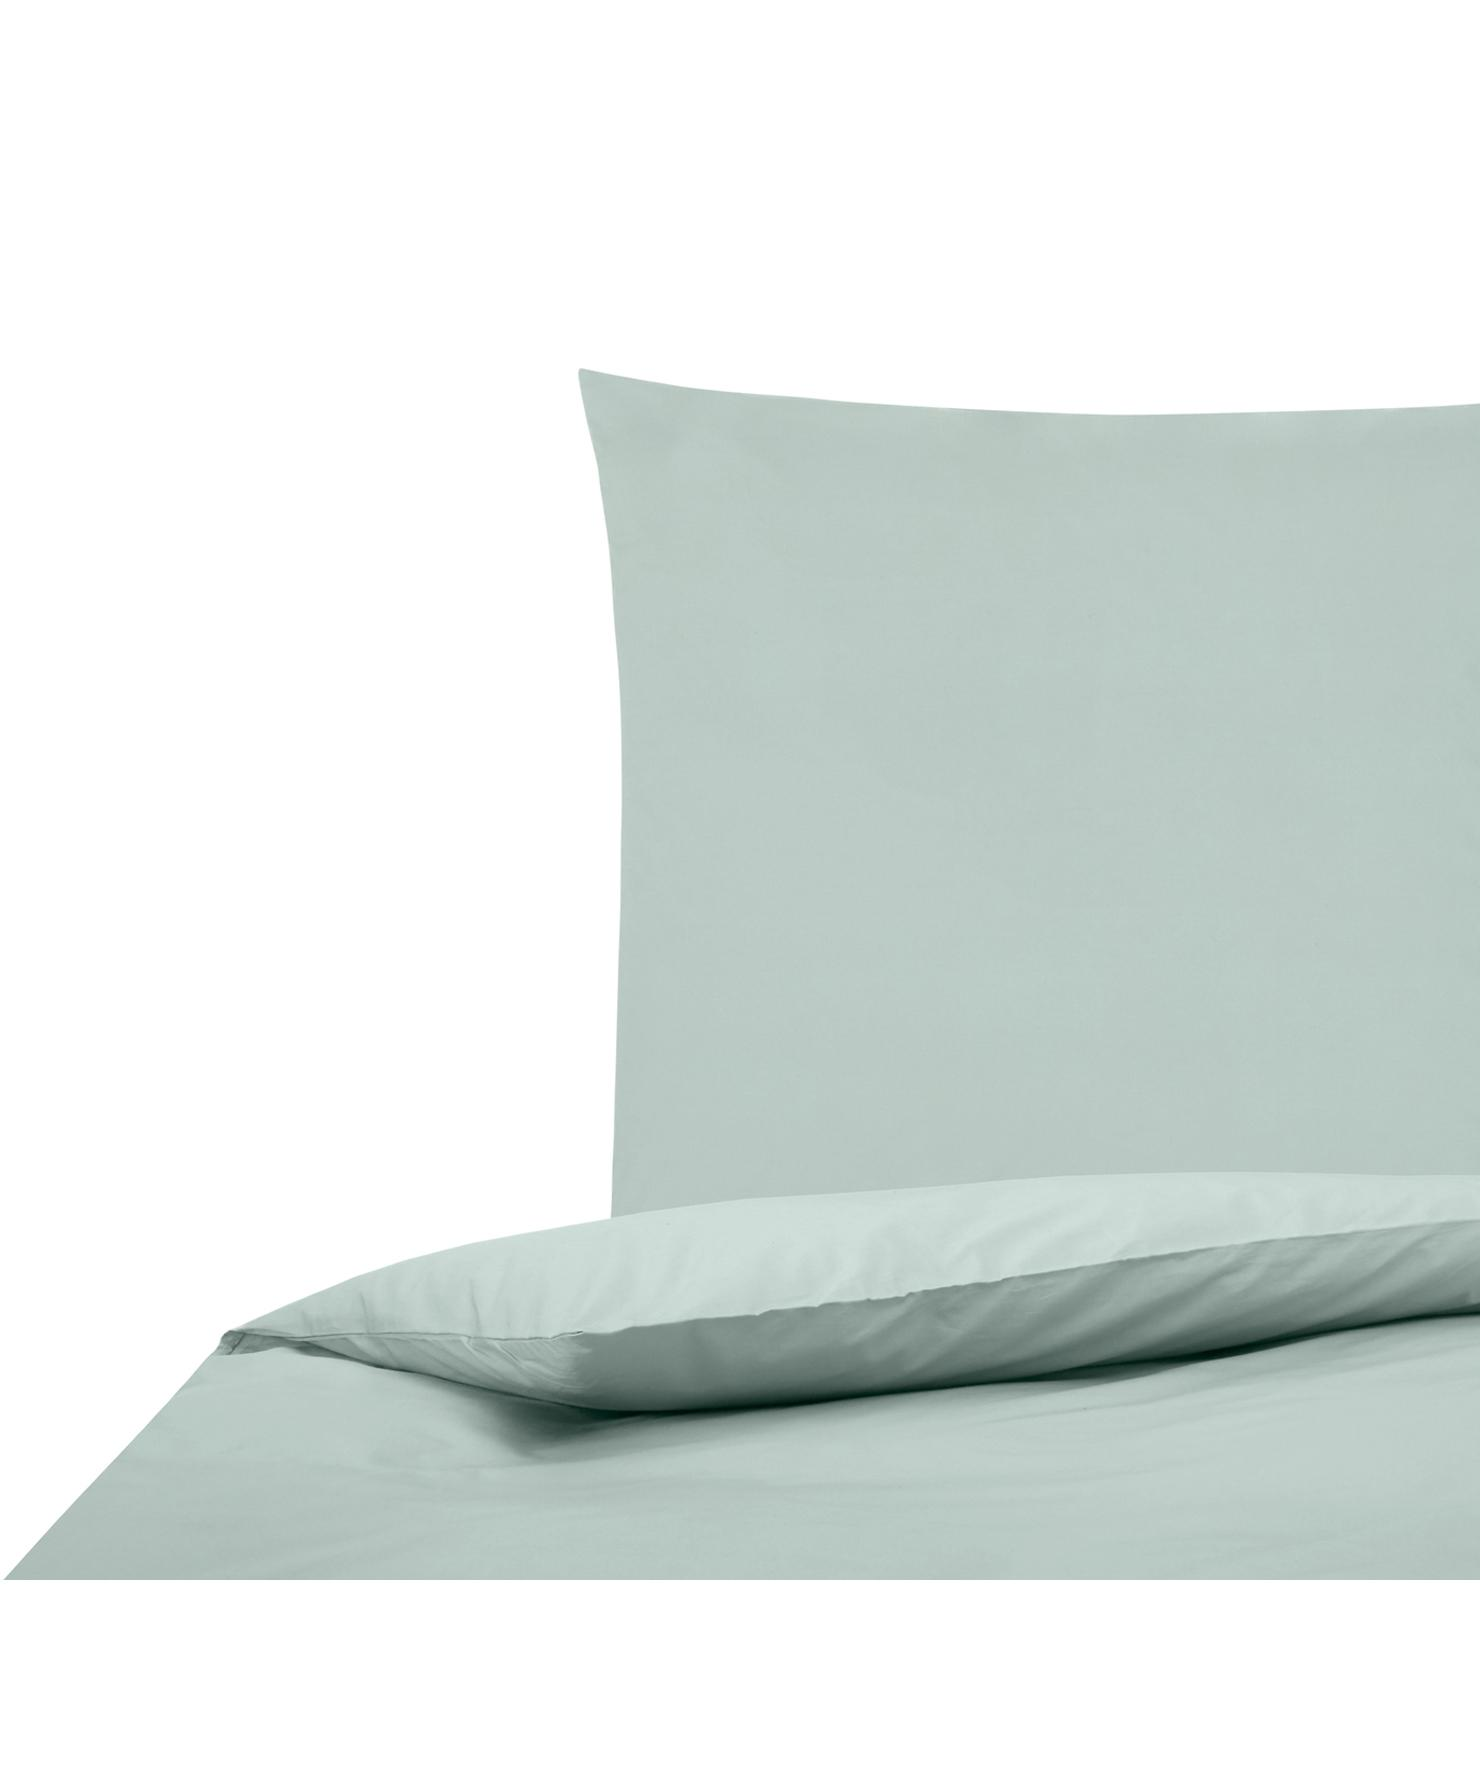 Perkal dekbedovertrek Elsie, Weeftechniek: perkal Draaddichtheid 200, Saliegroen, 140 x 200 cm